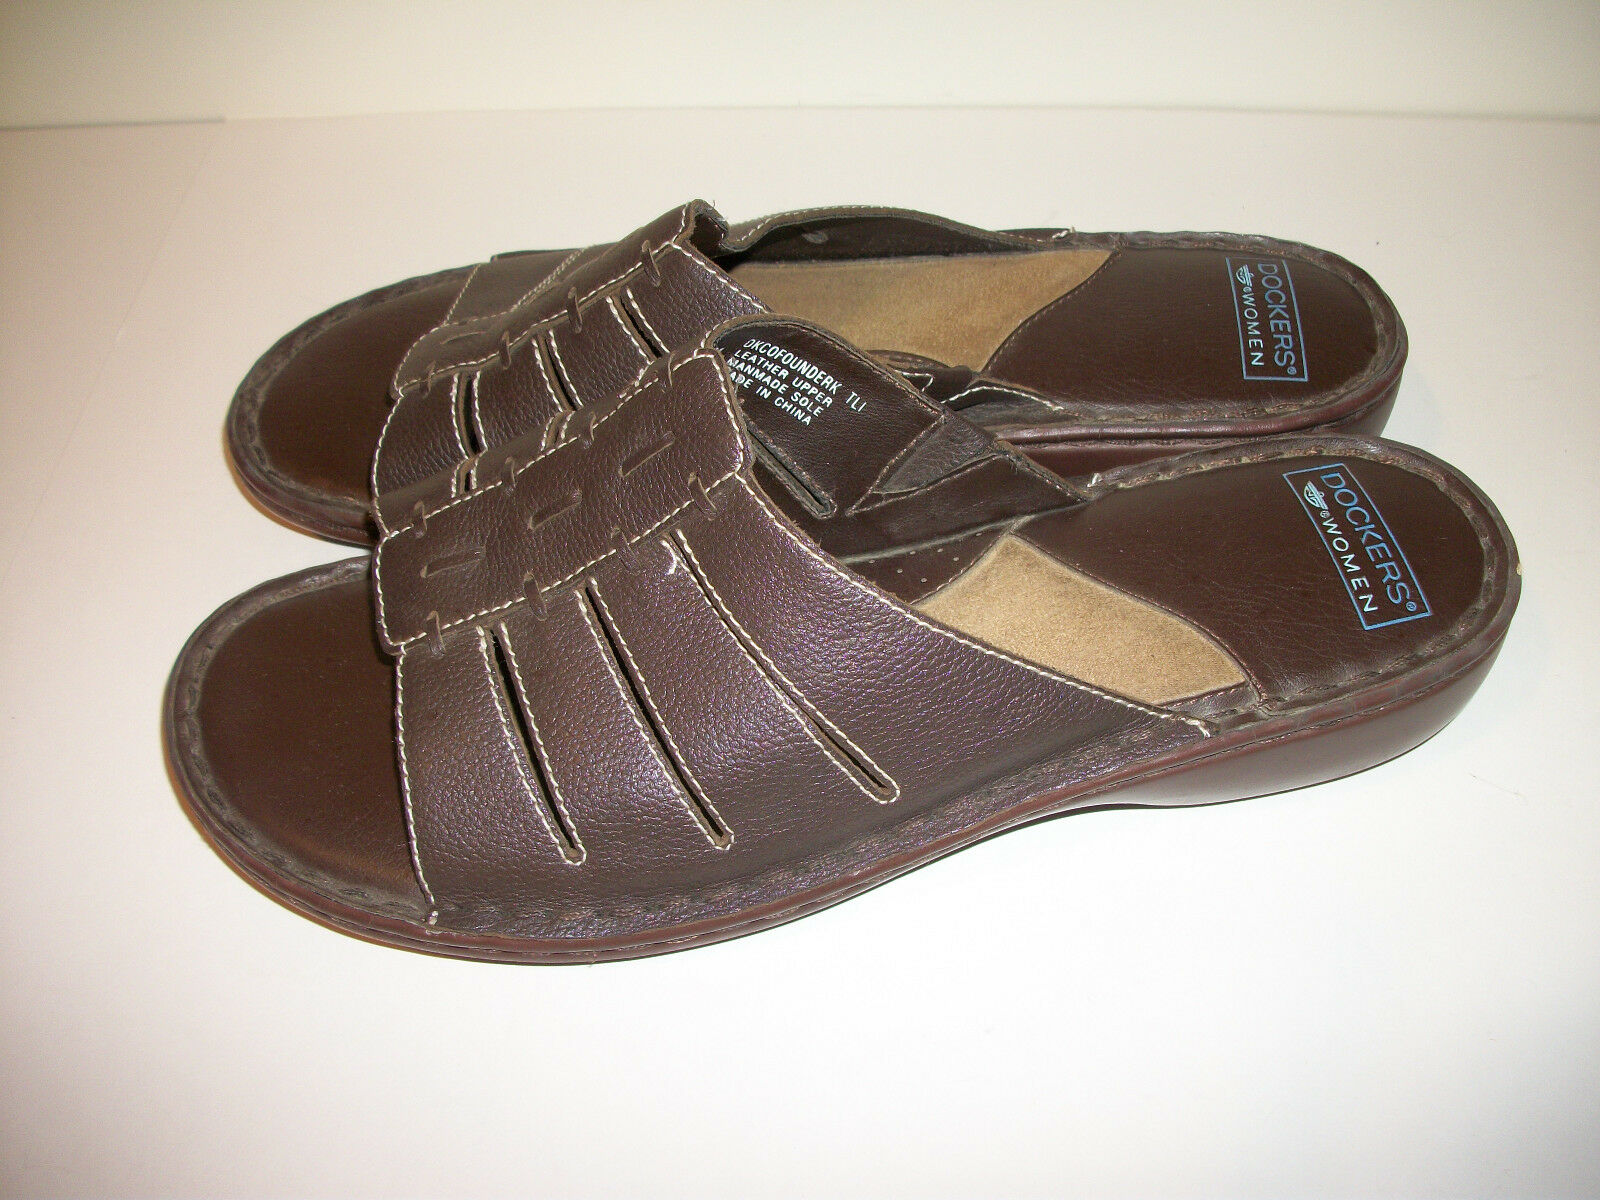 DOCKERS Brown Leather Sandals Slip On Slides Women's VGUC Sz 11 M - VGUC Women's ca02df